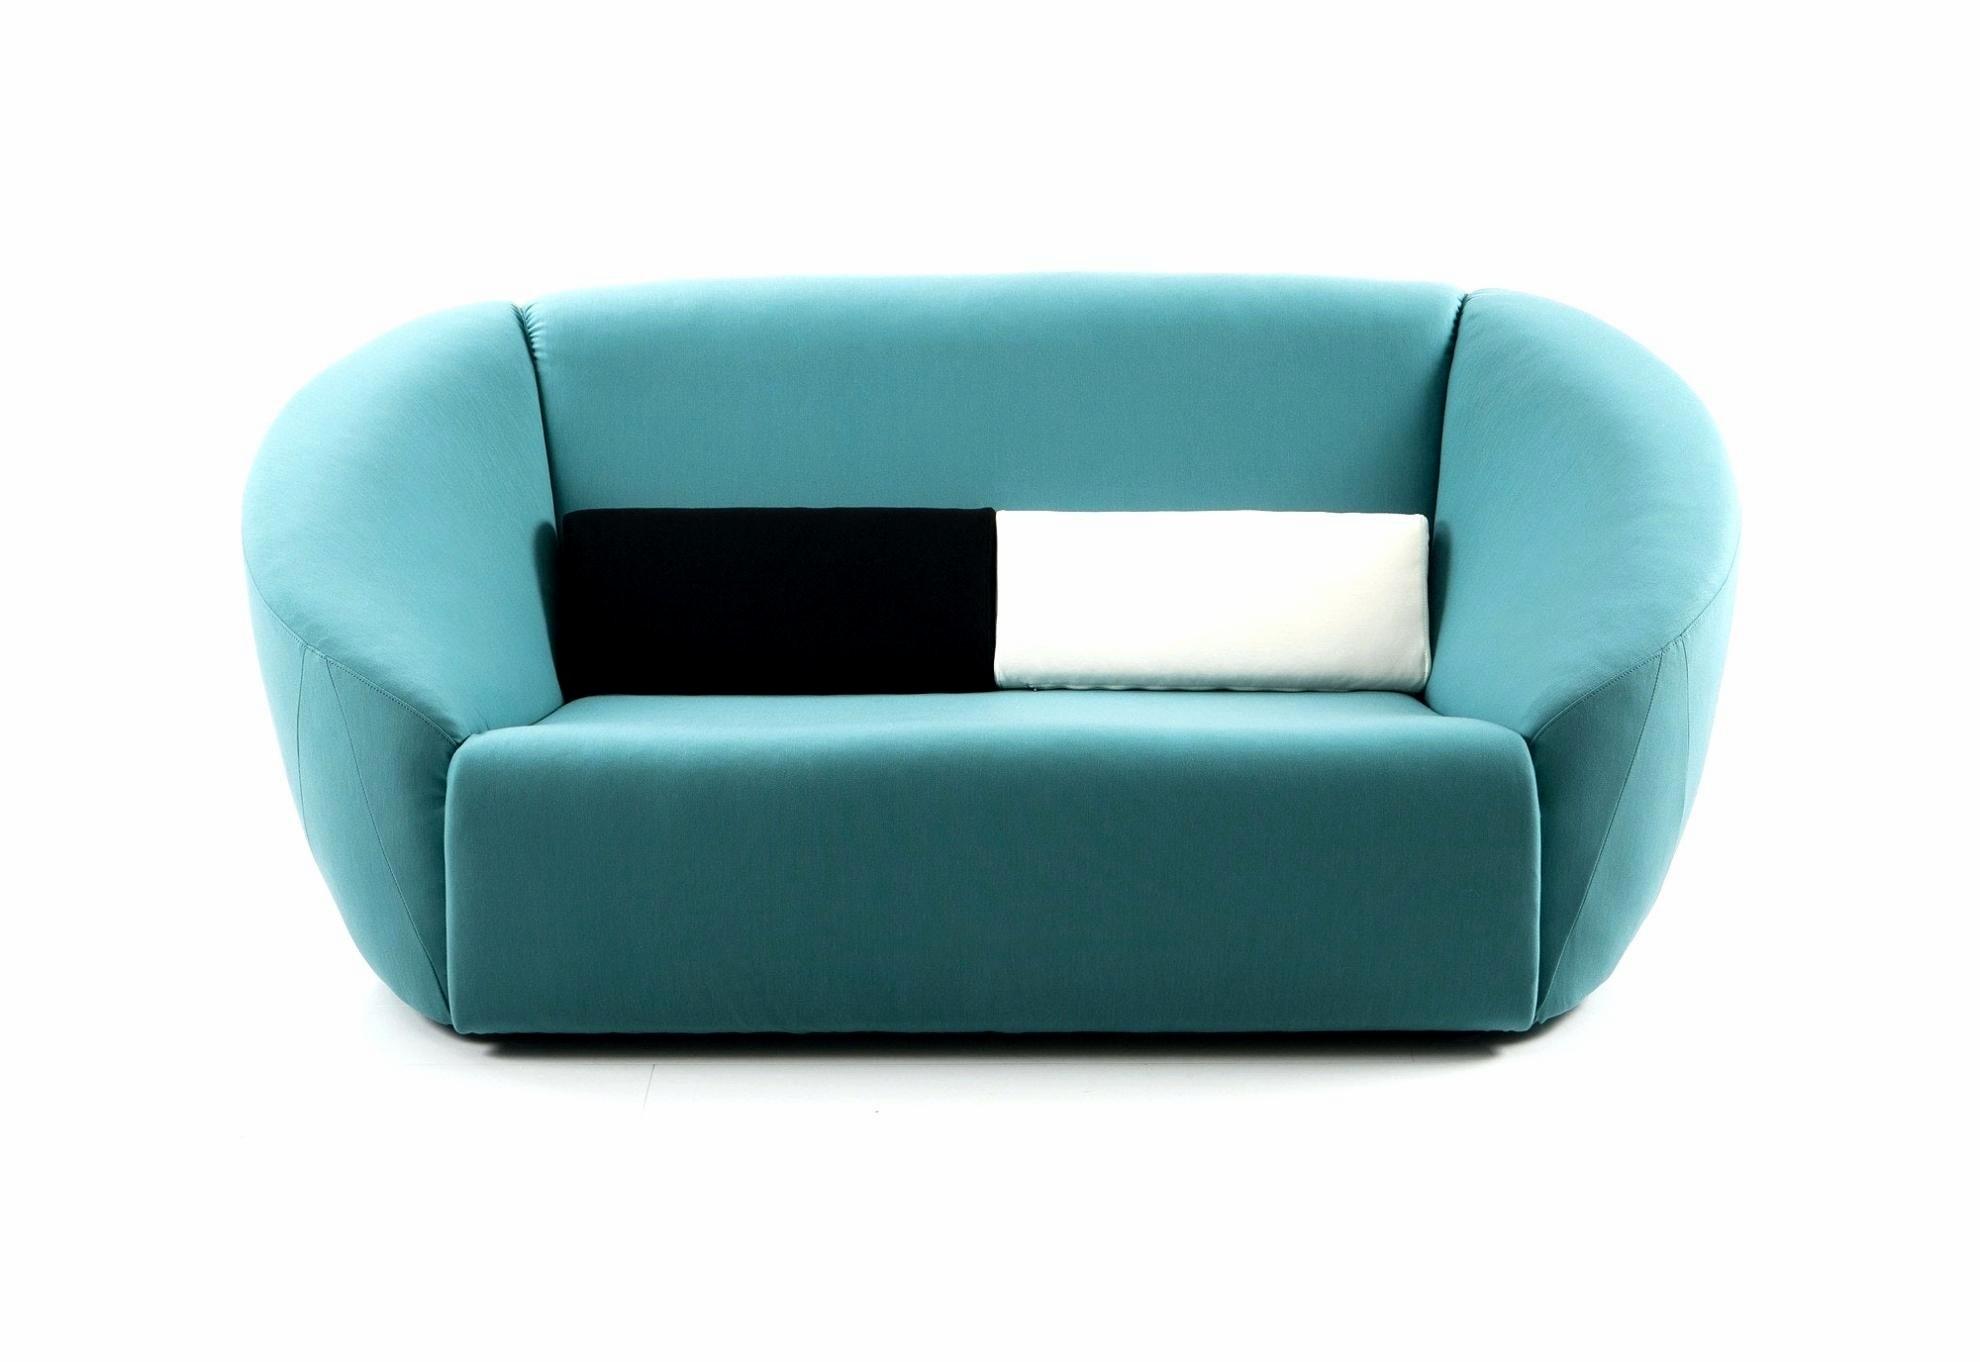 wohnkultur couch fur jugendzimmer sofa mini kinderzimmer schlafsofa fa 1 4 r mabelideen fur of